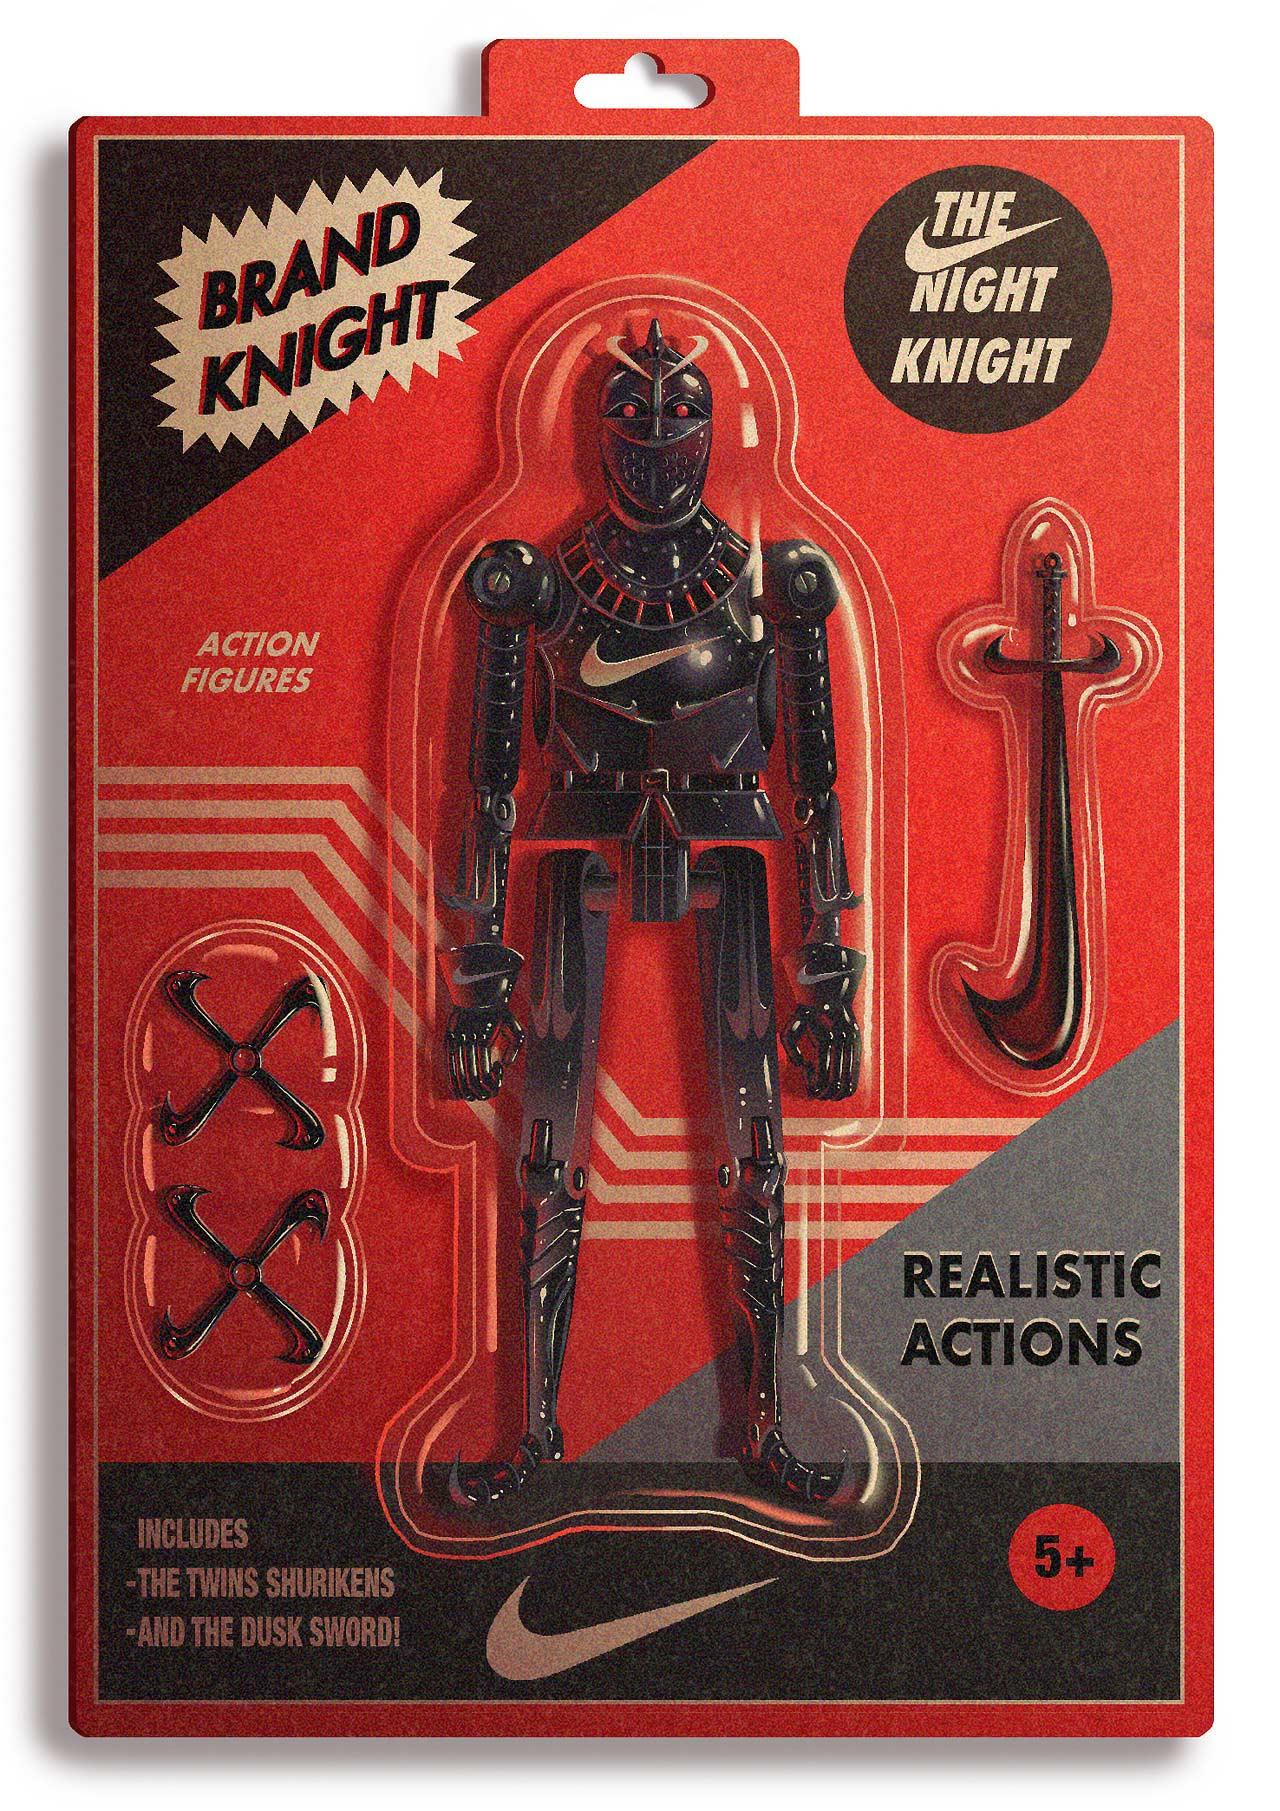 Brand Knights brand-knights_07